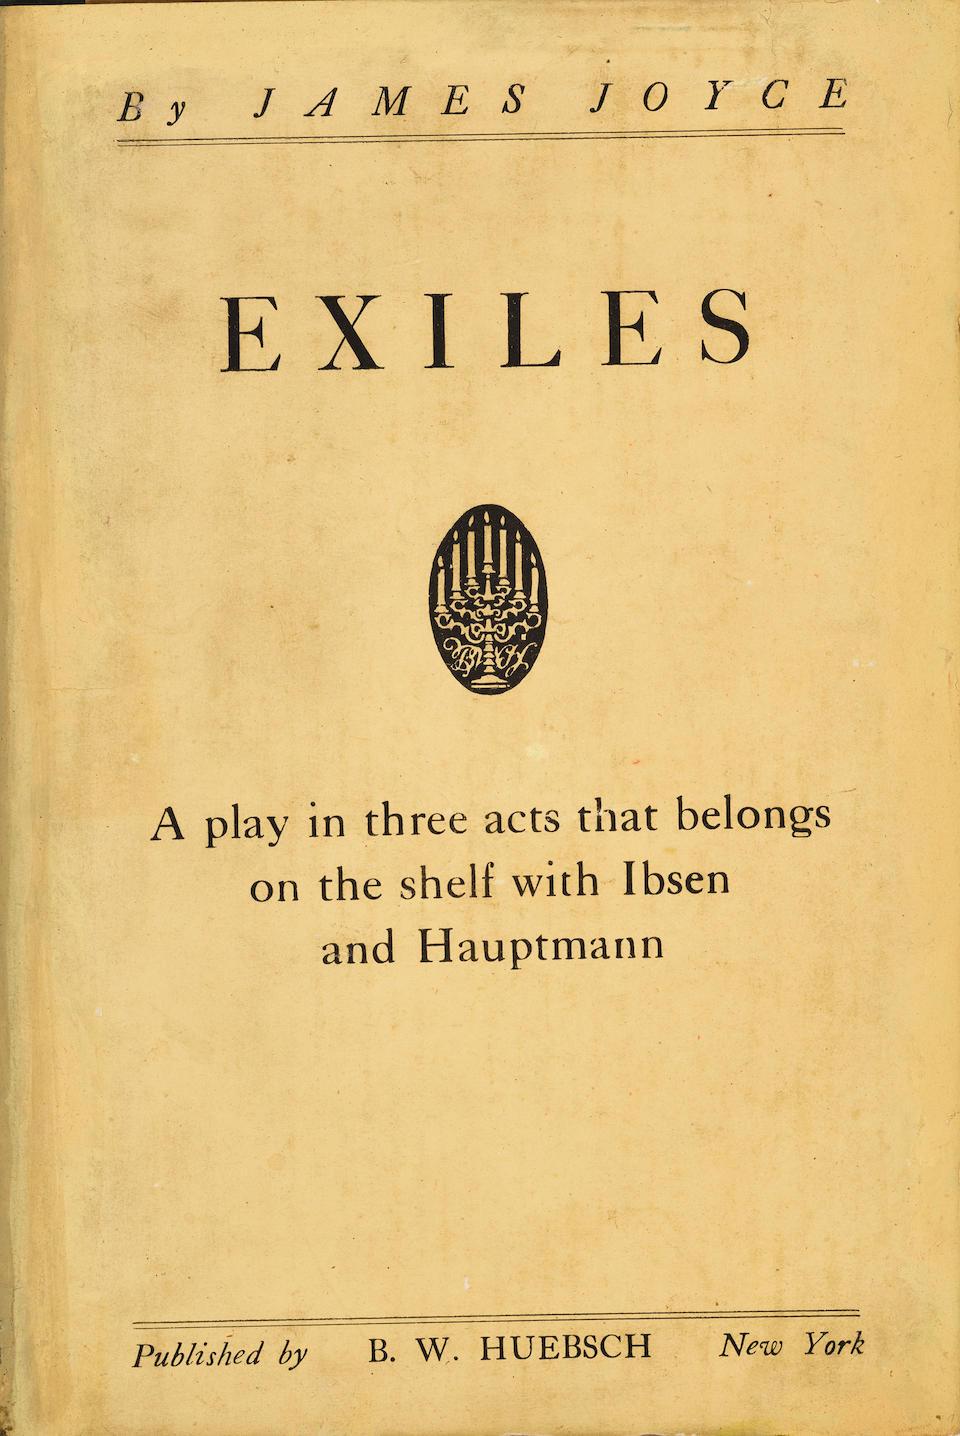 JOYCE, JAMES. 1882-1941. Exiles.  New York: B.W. Huebsch, 1918.